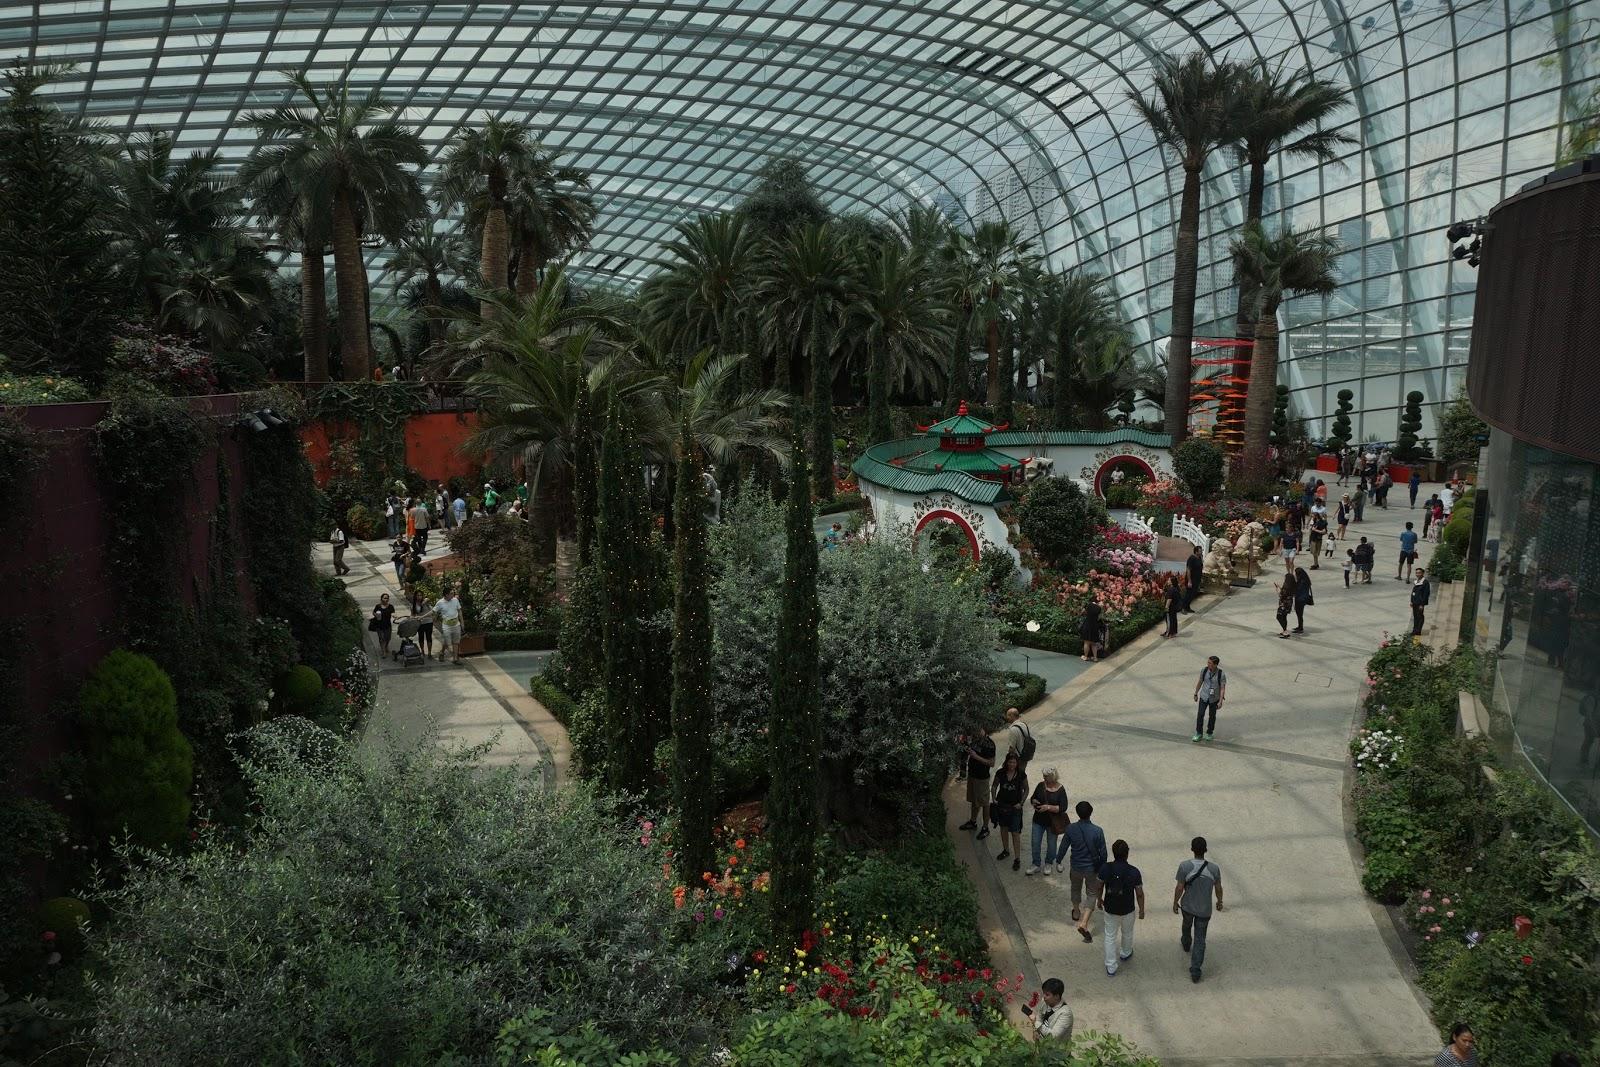 My Passion Tiket Masuk Garden By The Bay Singapore Anak Di Area Ini Suhu Lebih Kering Namun Tetap Sejuk Ada Sekitar 30000 Jenis Bunga Dari 150 Spesies Yang Diambil Seluruh Dunia